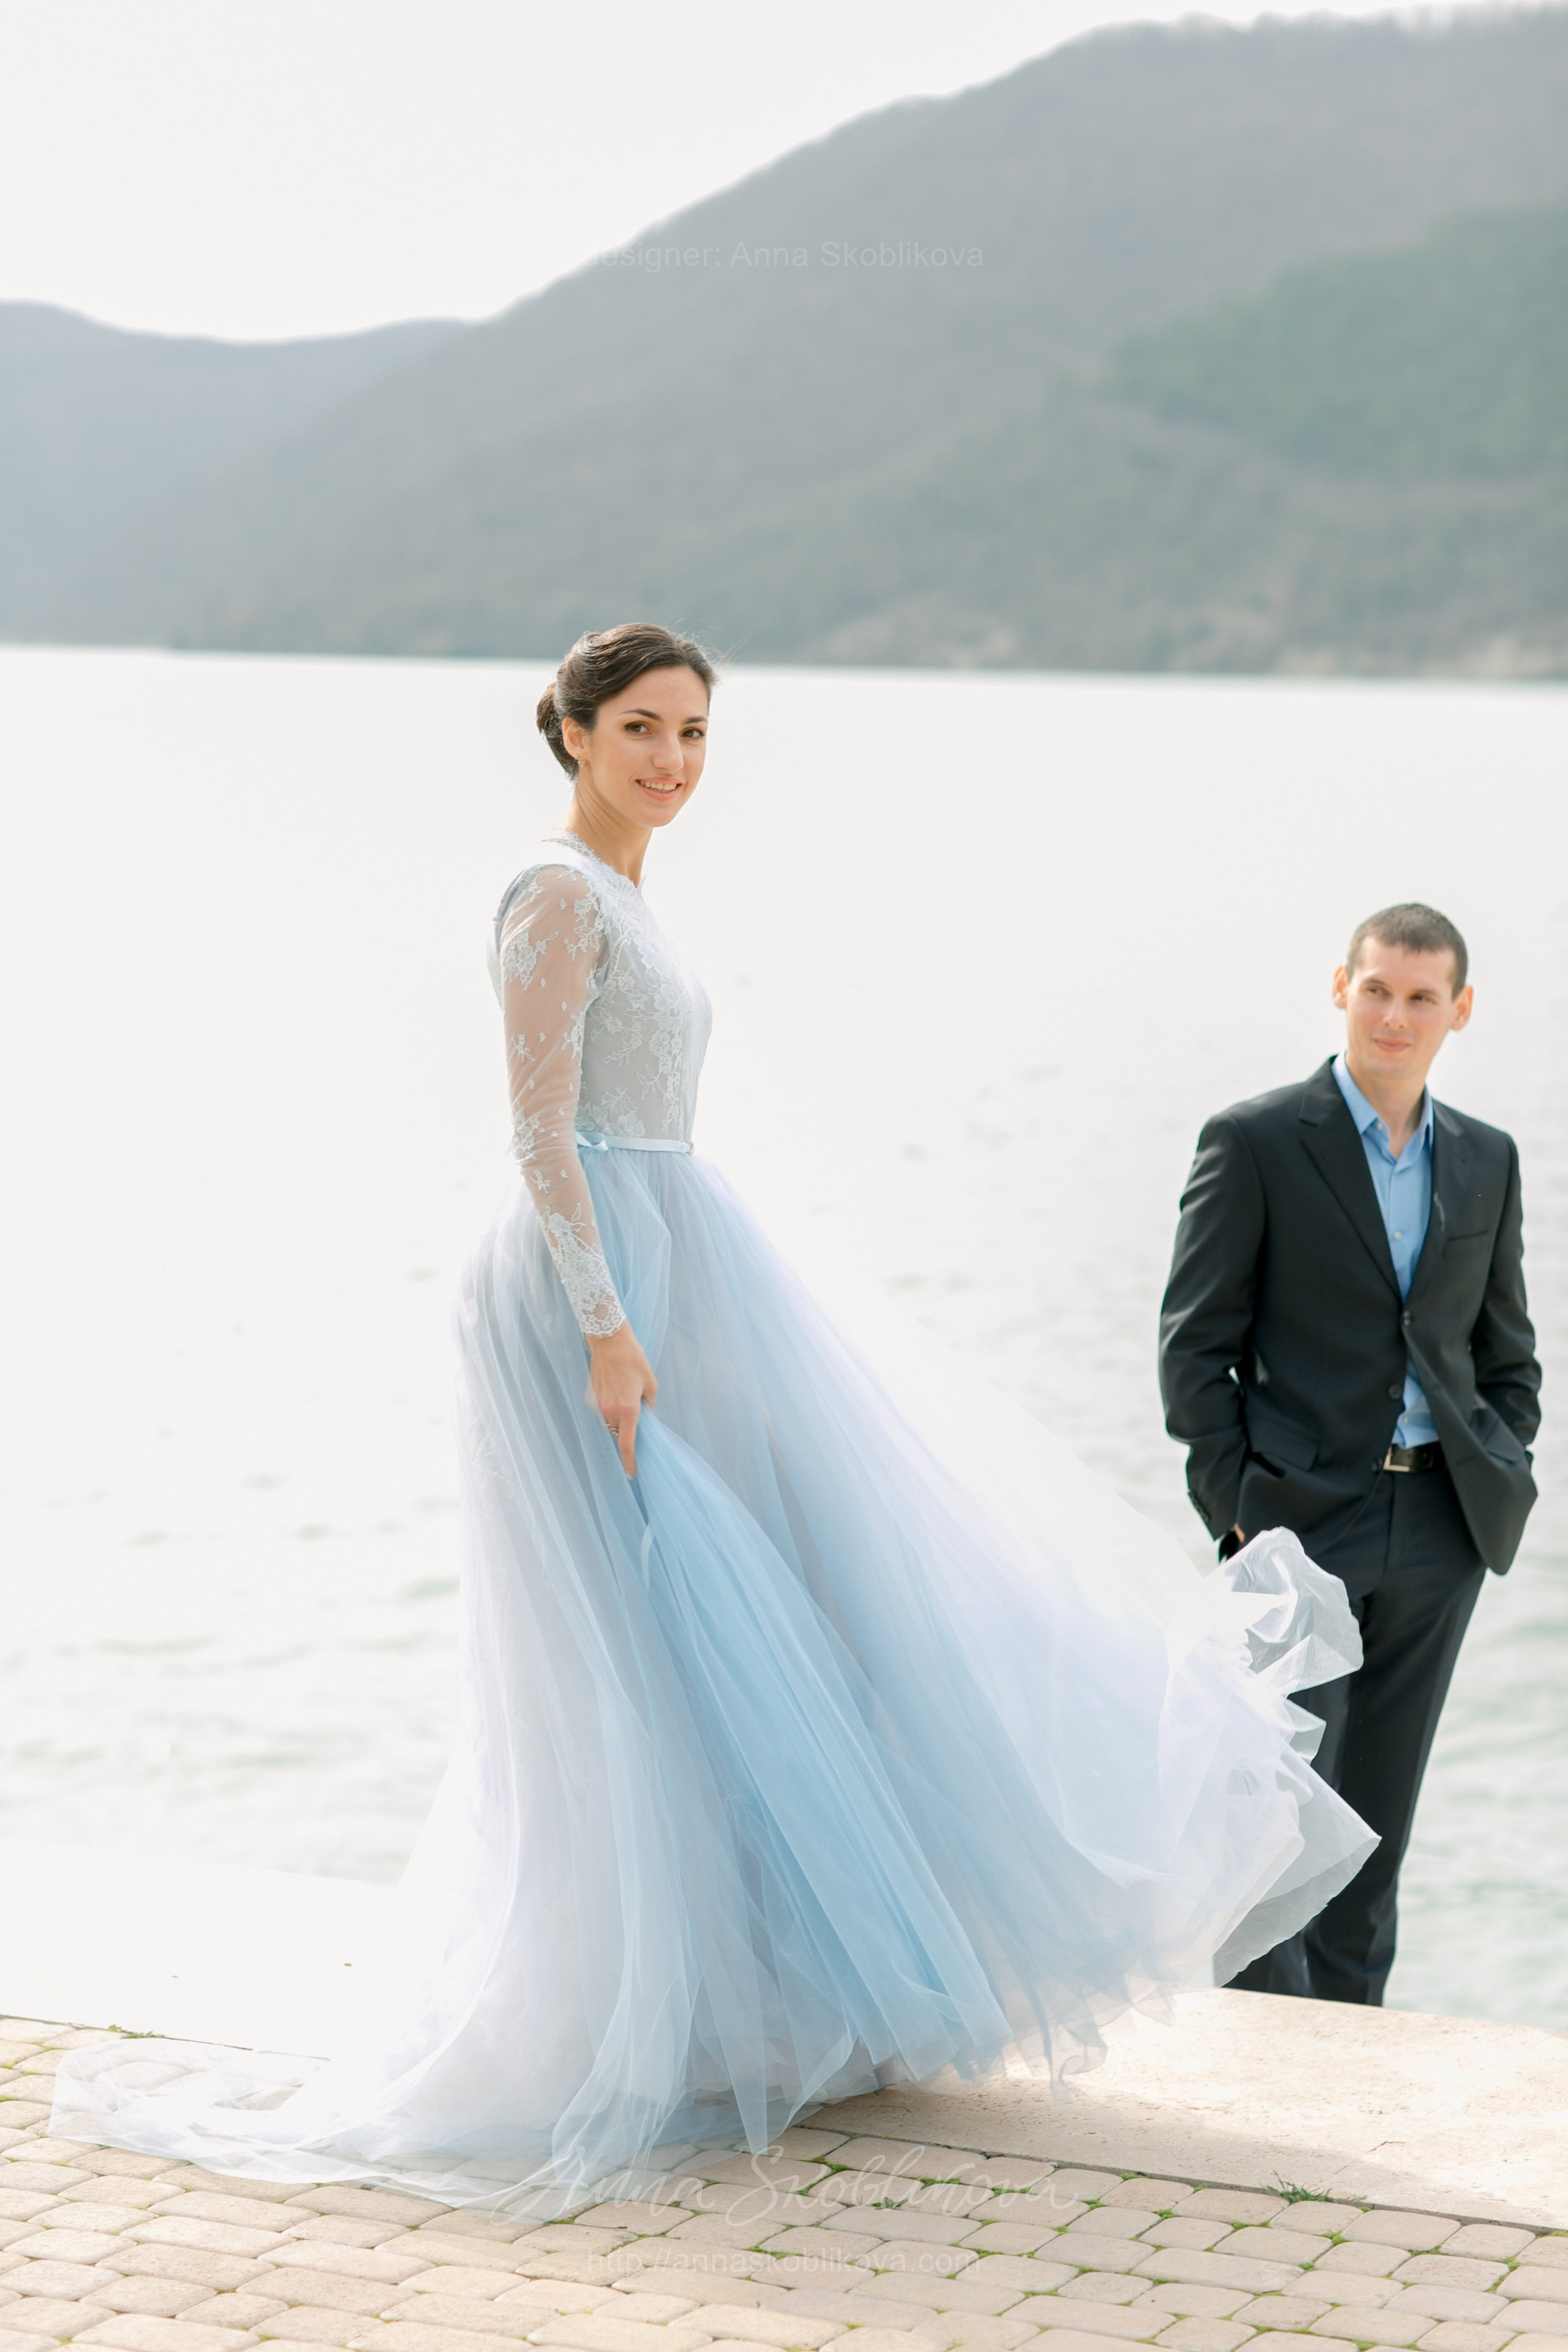 Light blue wedding gown anna skoblikova evening and wedding light blue wedding gown junglespirit Gallery